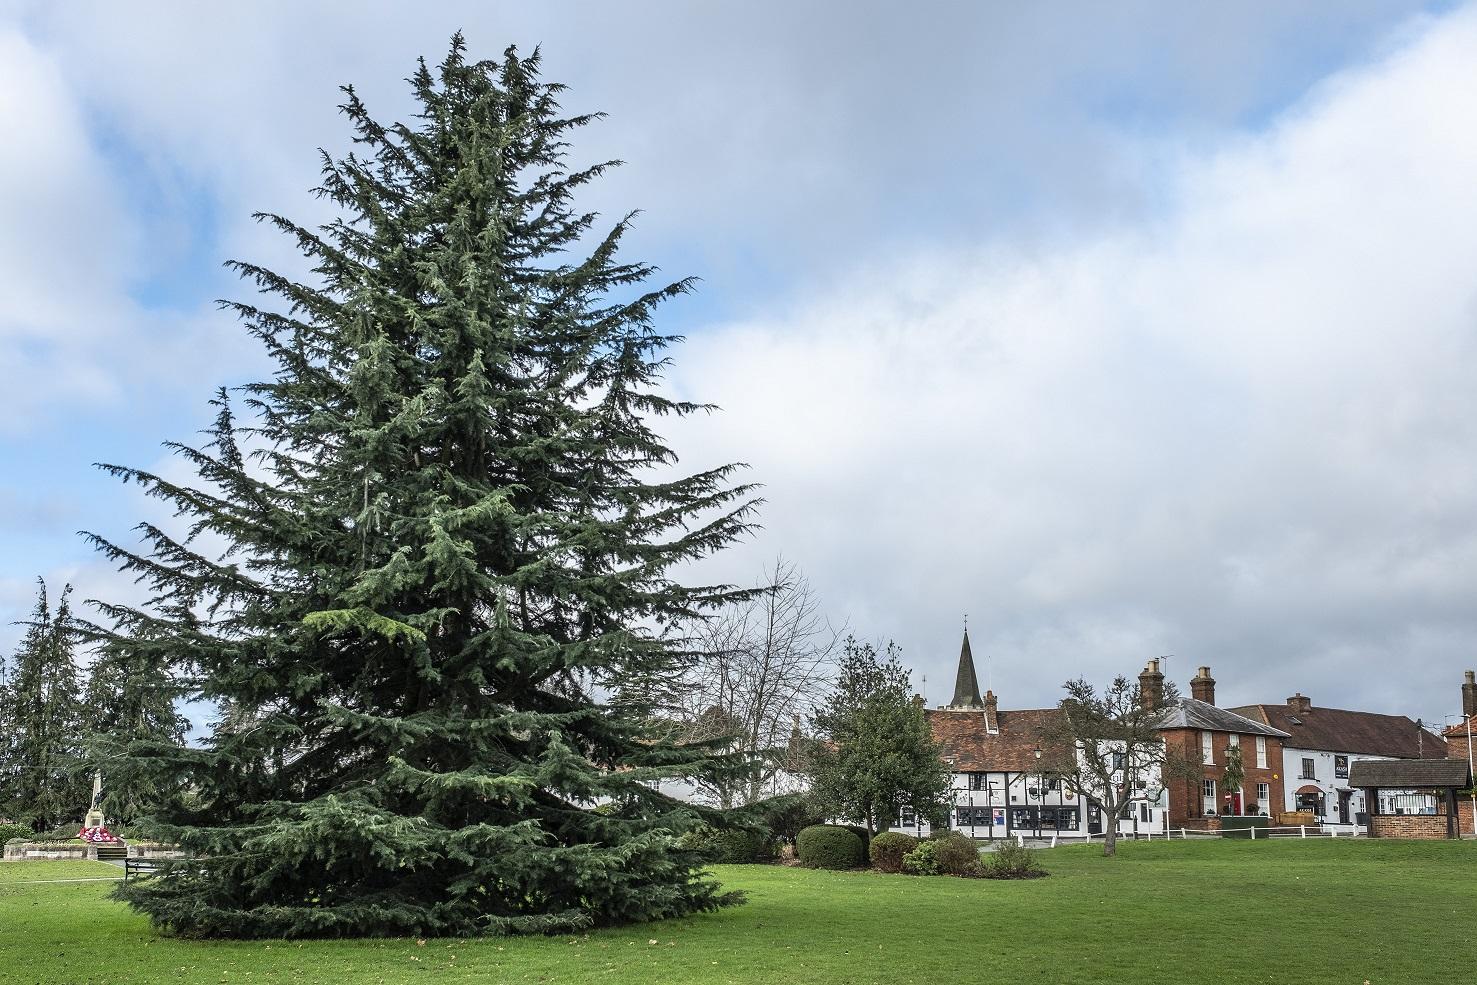 Burnham Tree and village